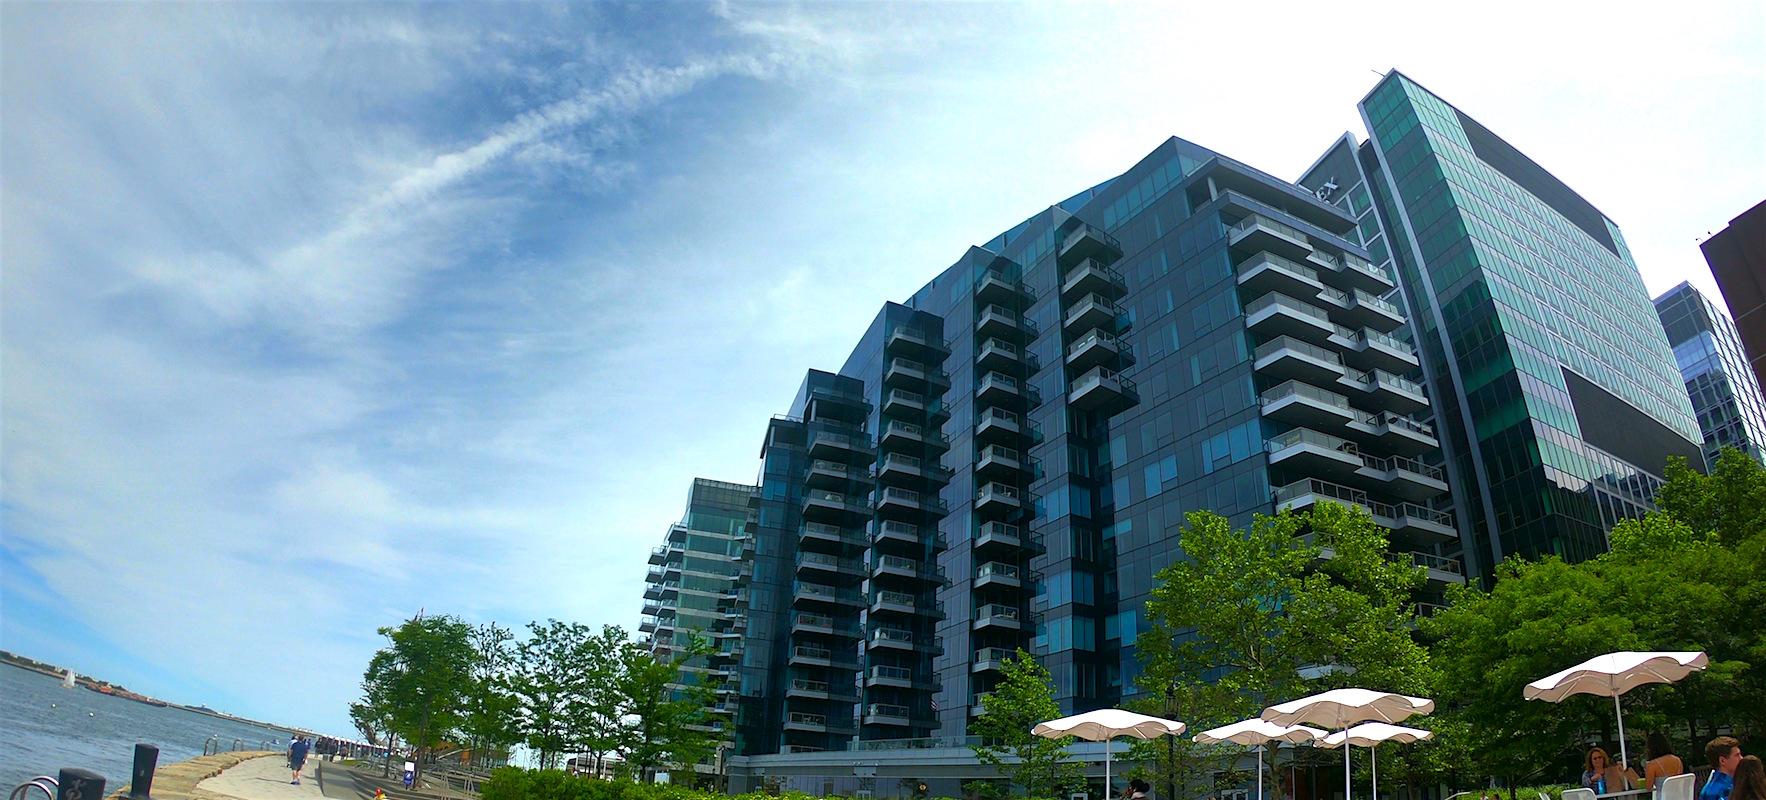 Luxury Boston Condos at 22 Liberty Drive Seaport